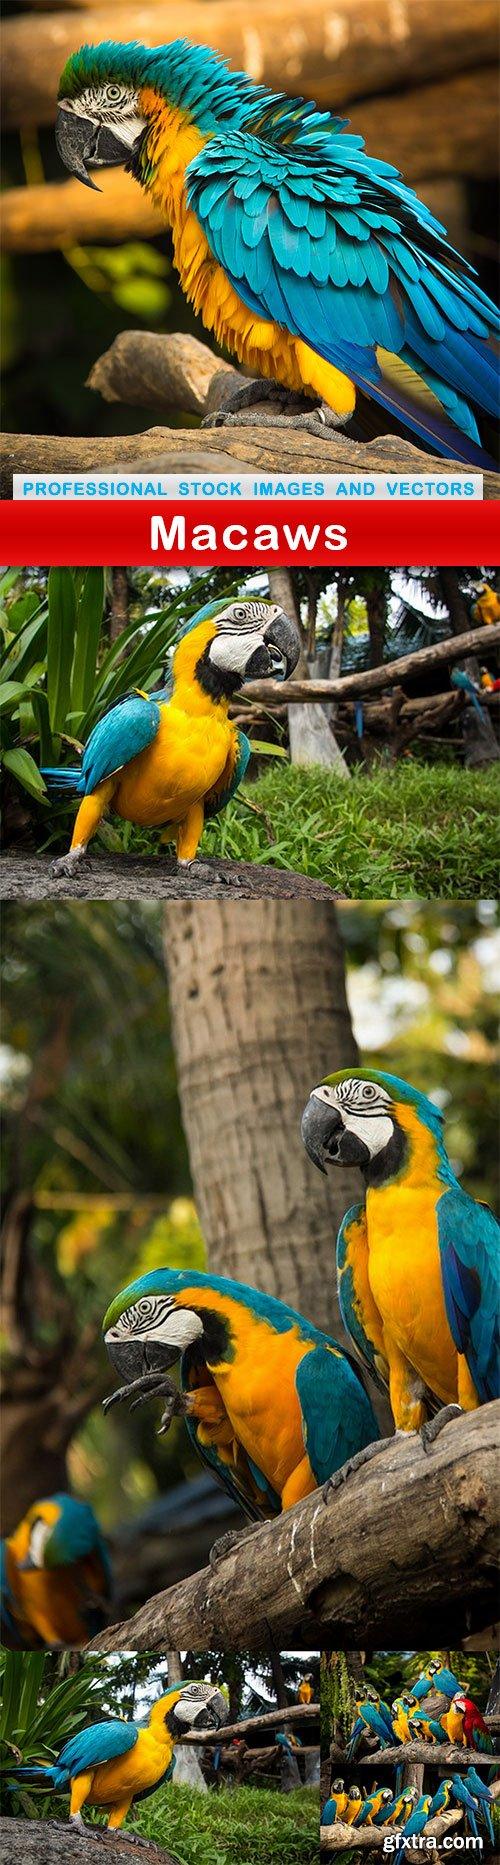 Macaws - 6 UHQ JPEG